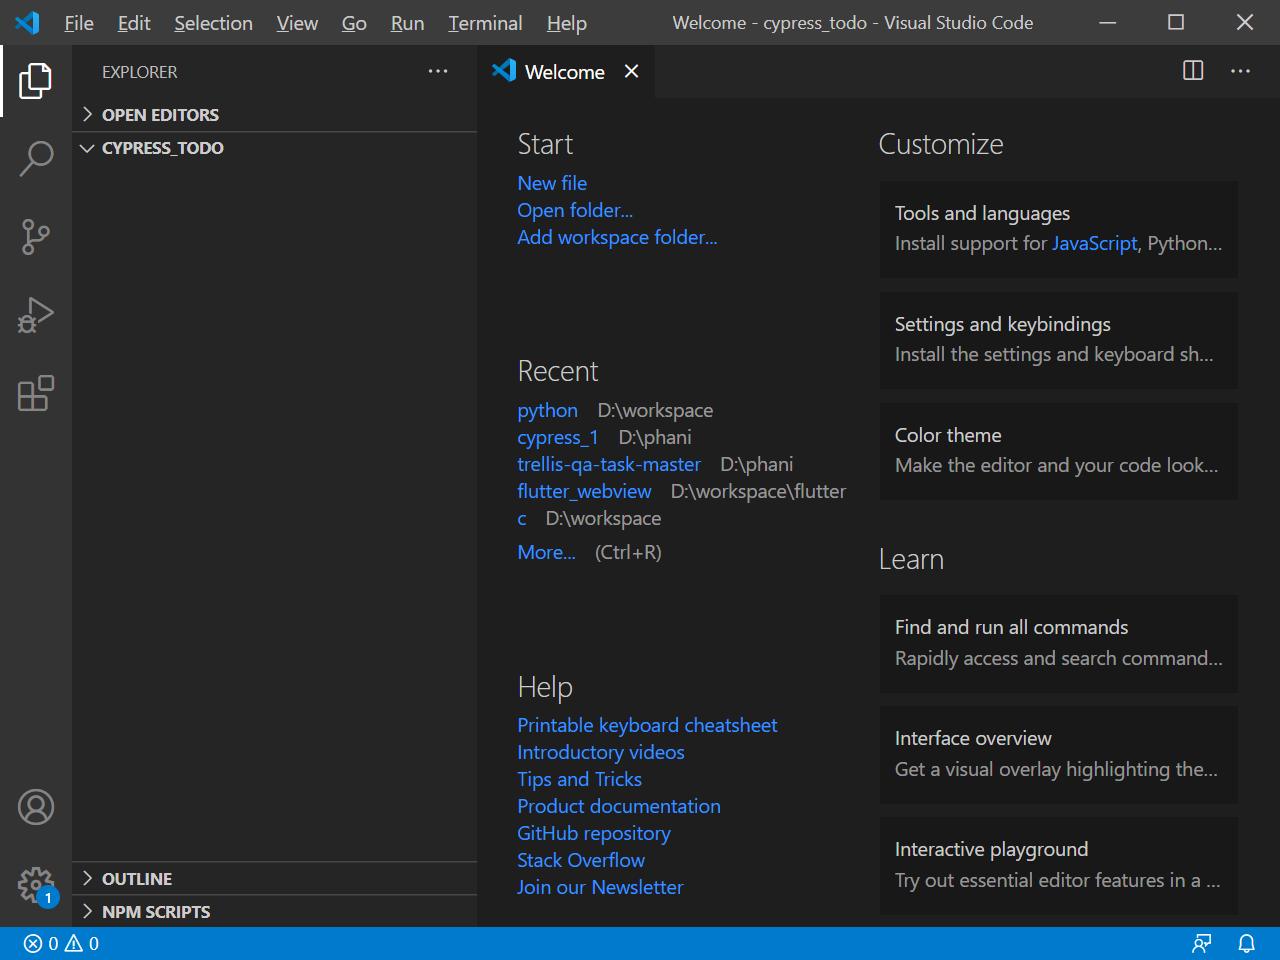 Cypress Tutorial - Open Visual Studio IDE